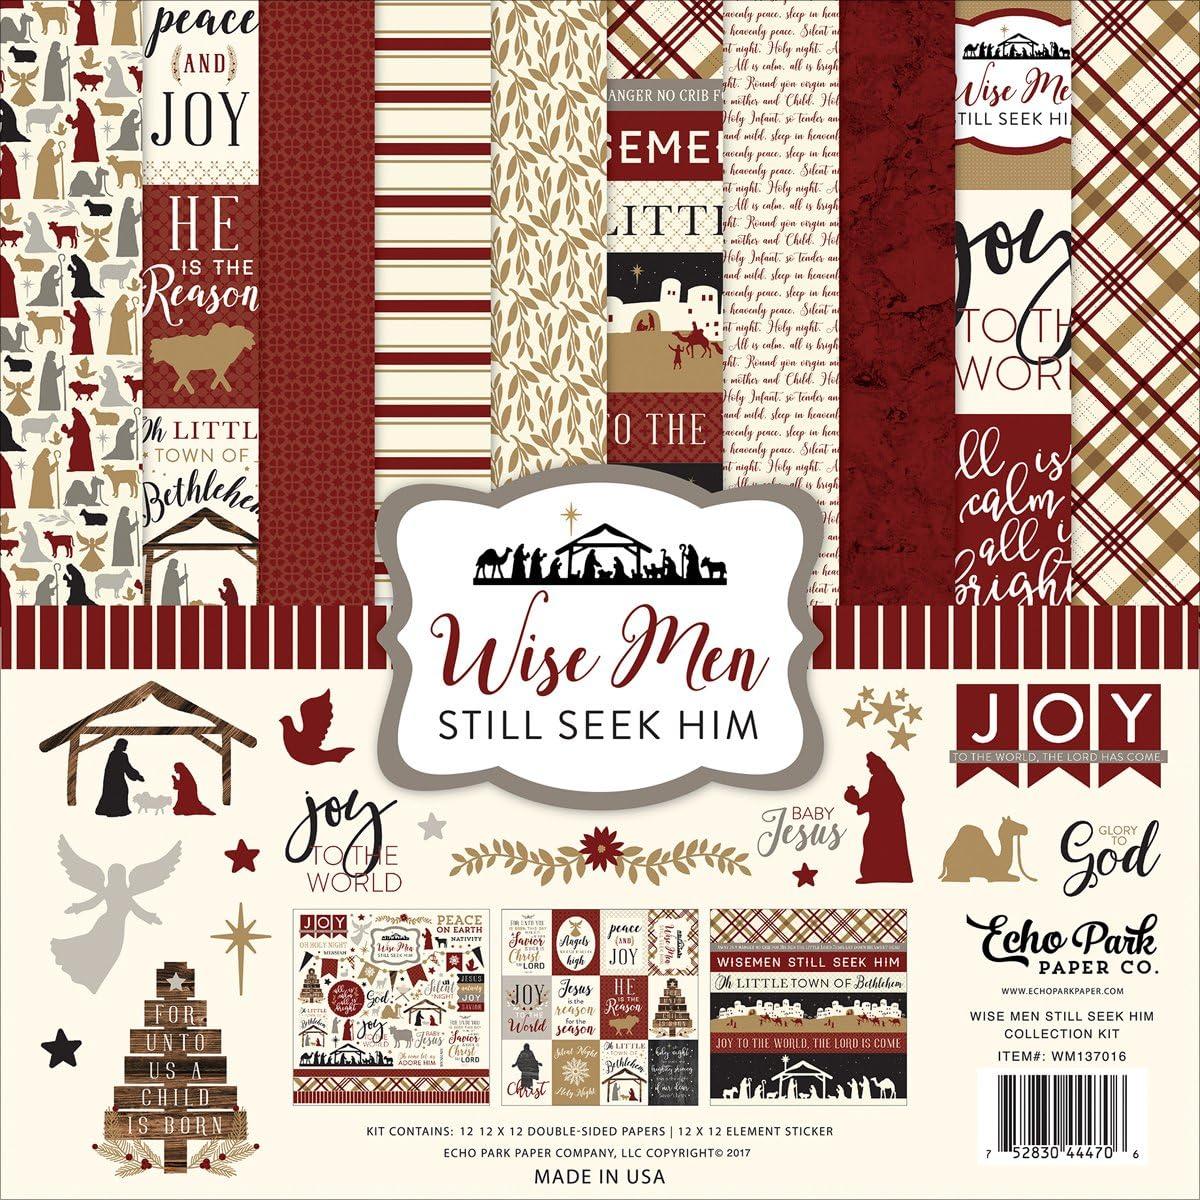 Echo Park Paper Company Wise Men Still Seek Him Collection Kit